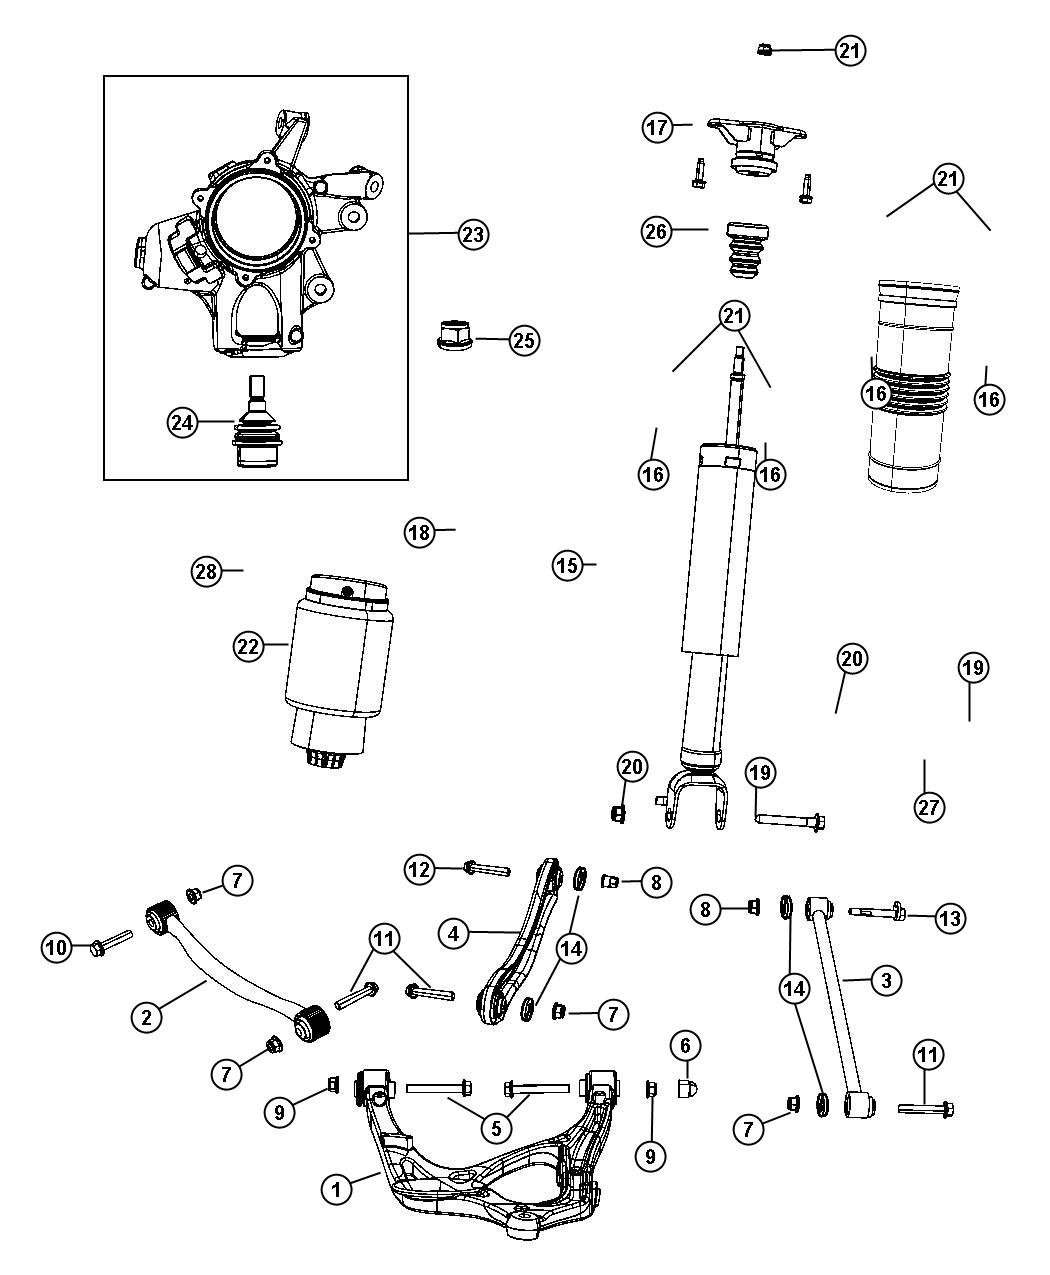 2012 Jeep Grand Cherokee Shock absorber kit. Suspension